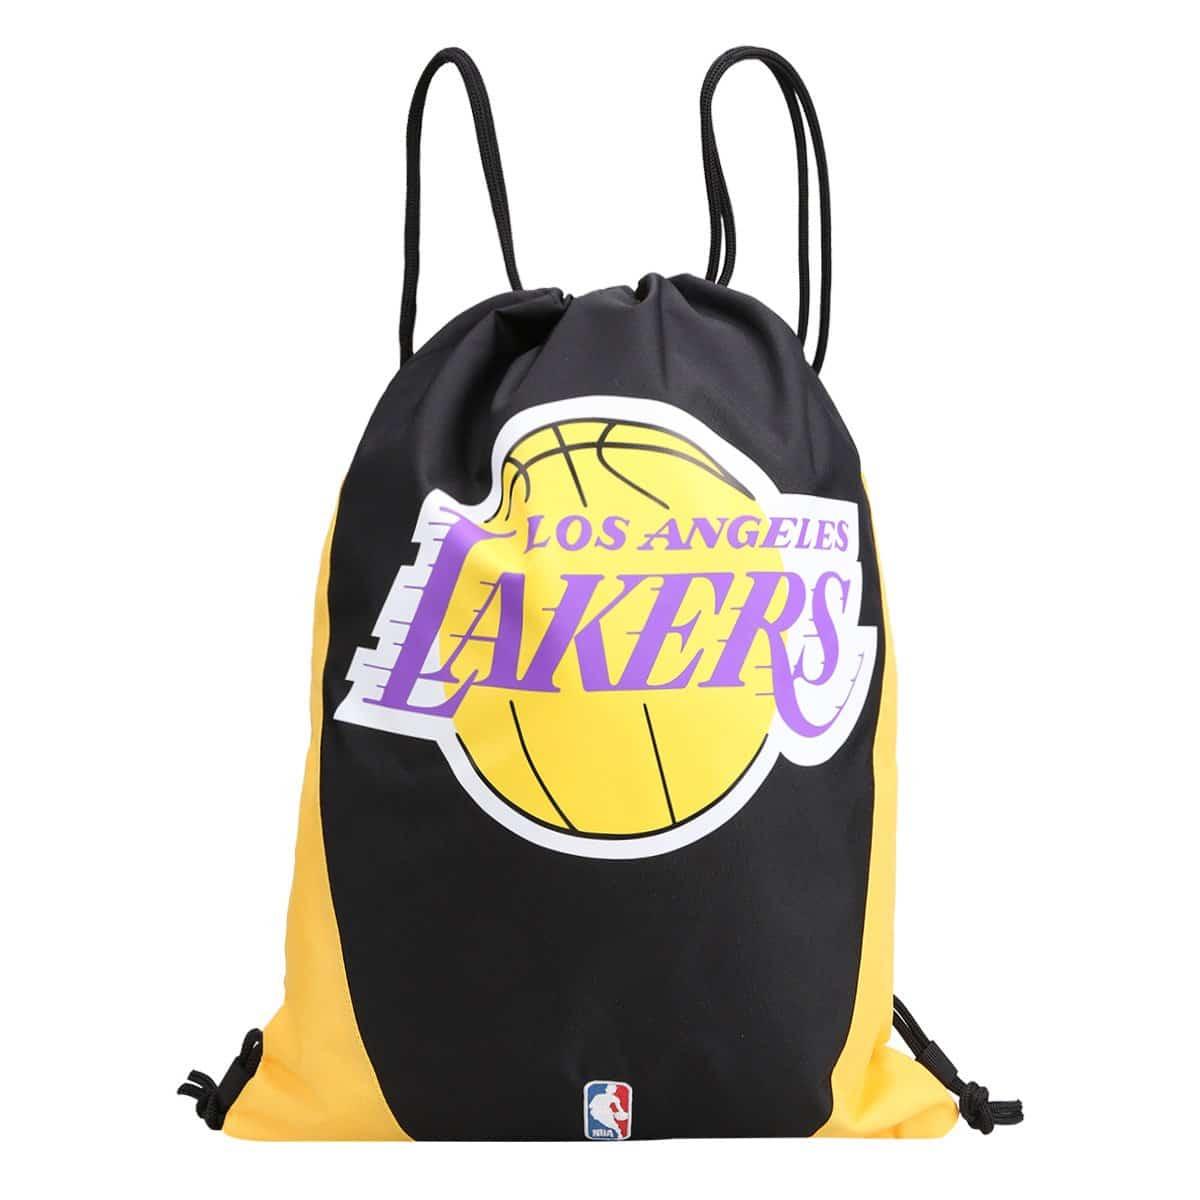 Mochila do Los Angeles Lakers